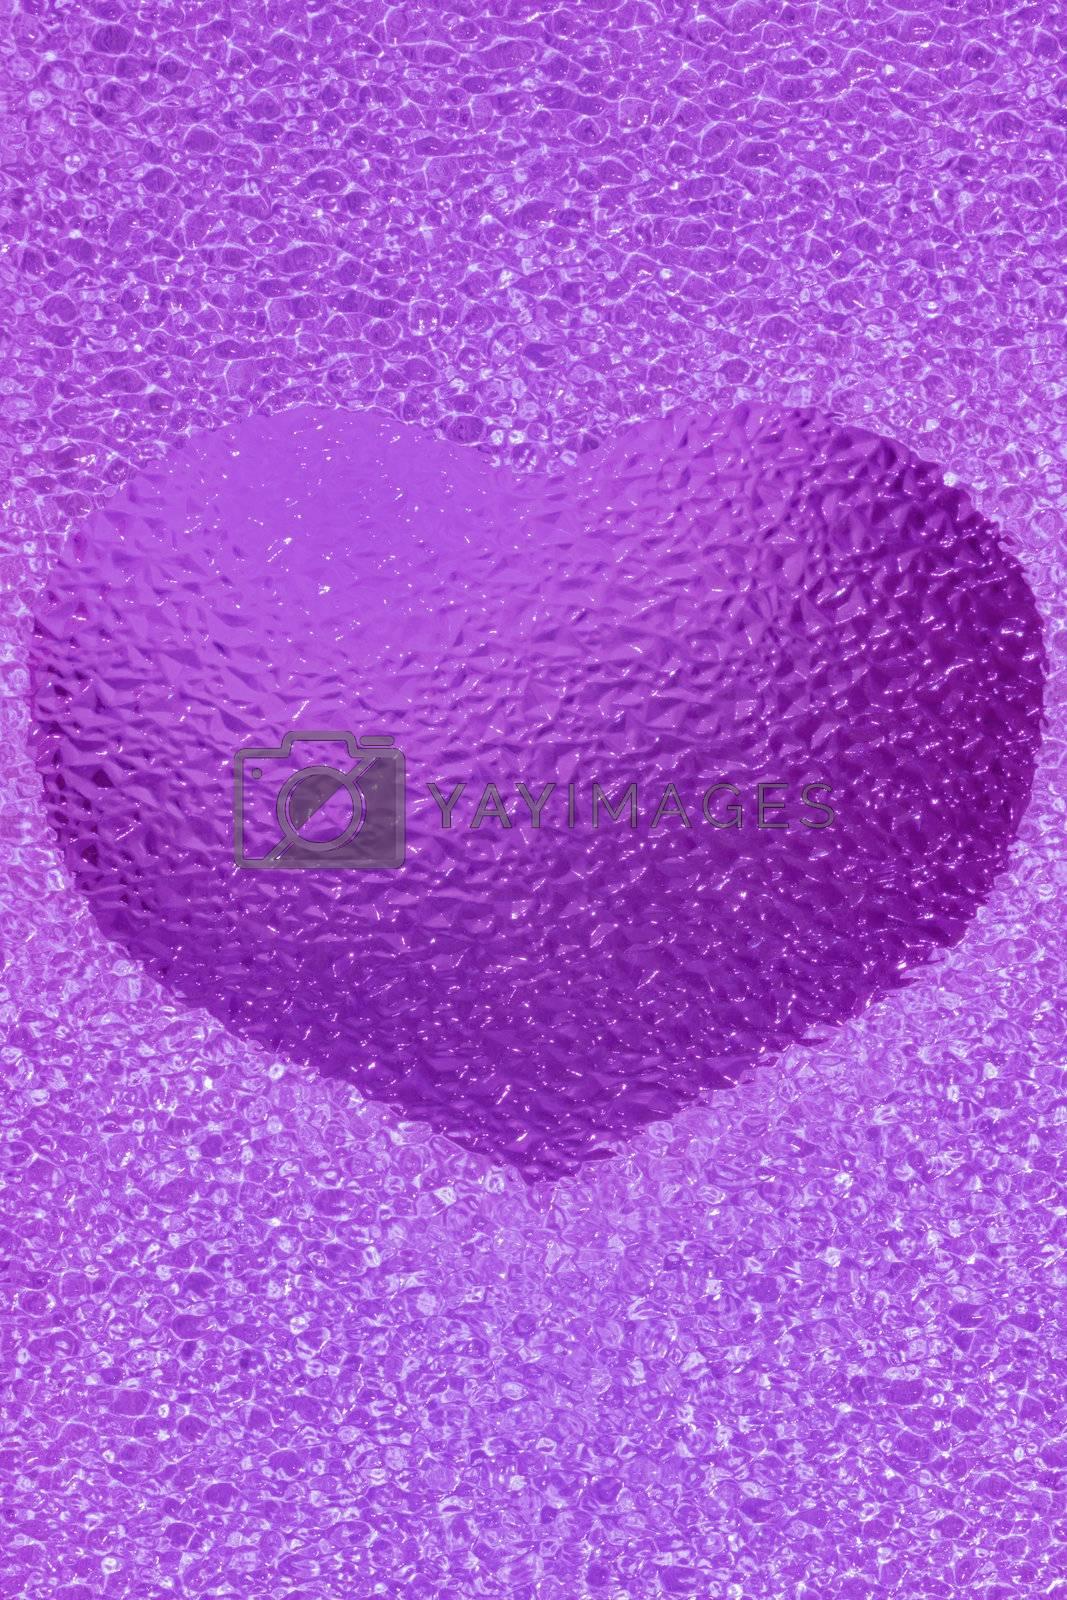 frozen golden heart with crystals in 3d